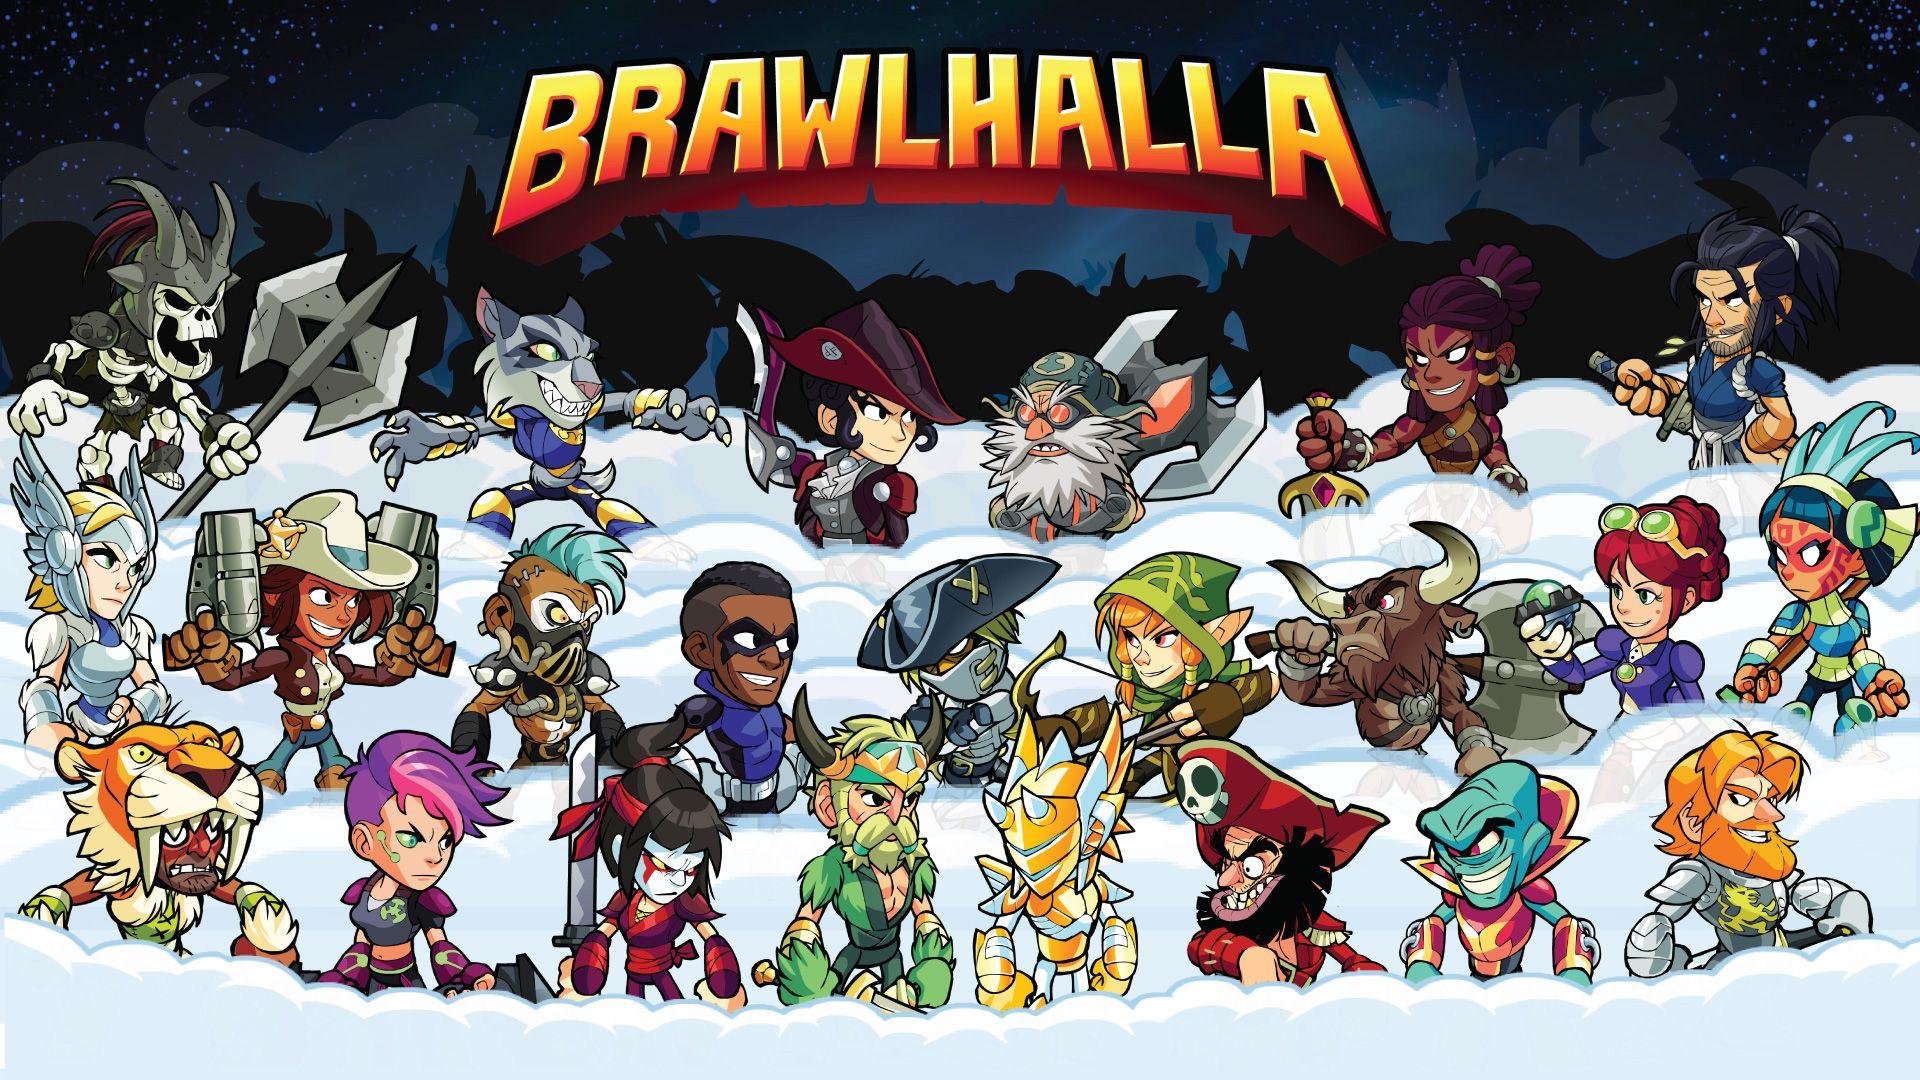 Video Game Brawlhalla 1920x1080